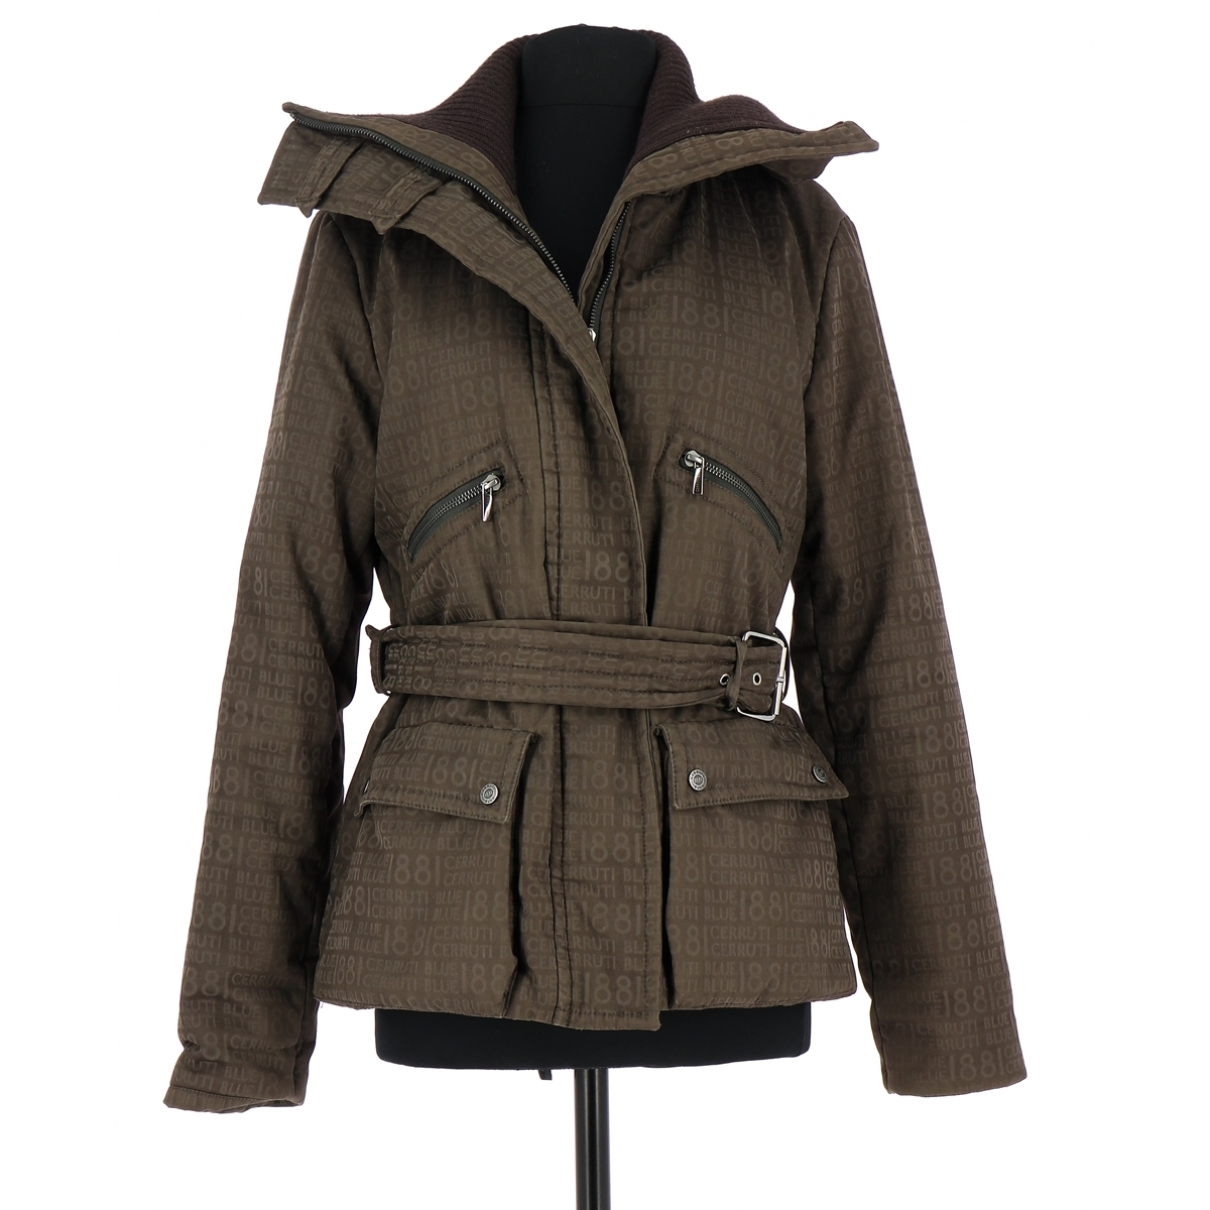 Cerruti \N Brown Cotton coat for Women 38 FR